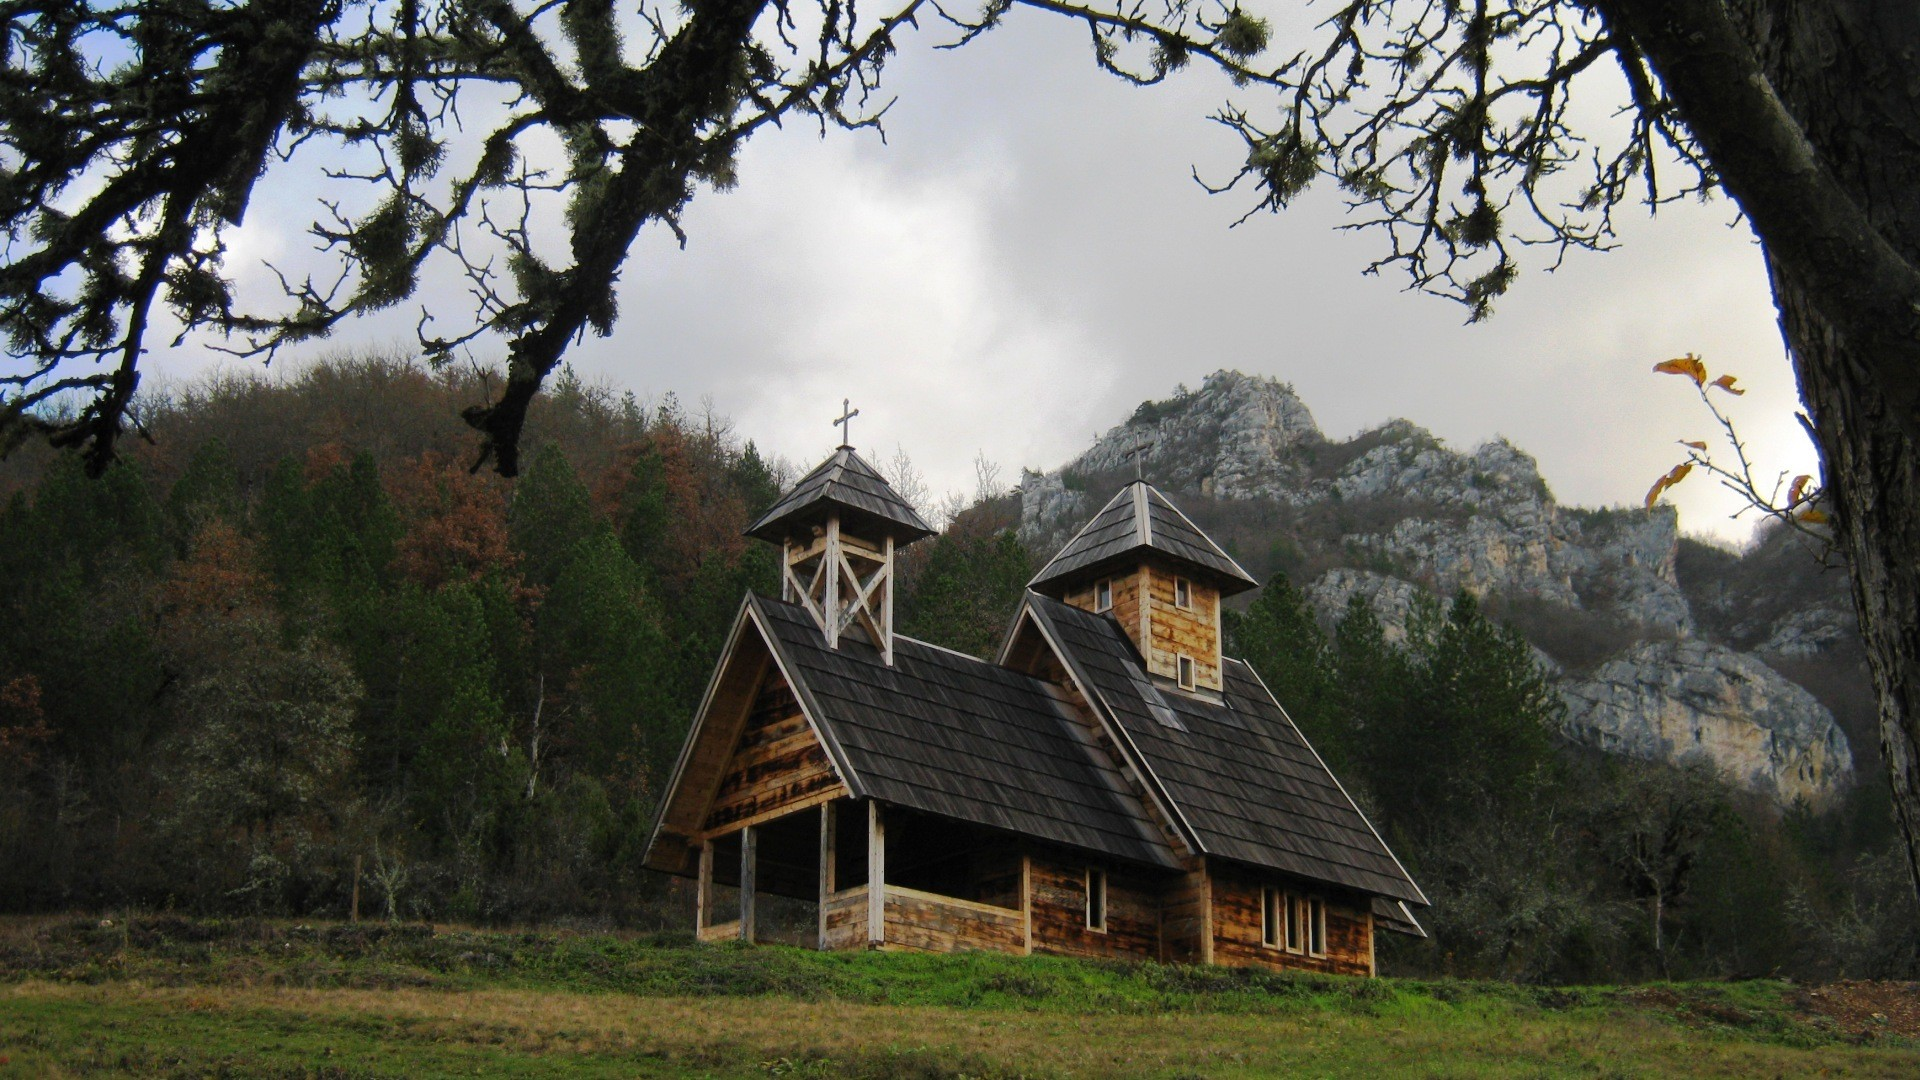 Crkva u planini